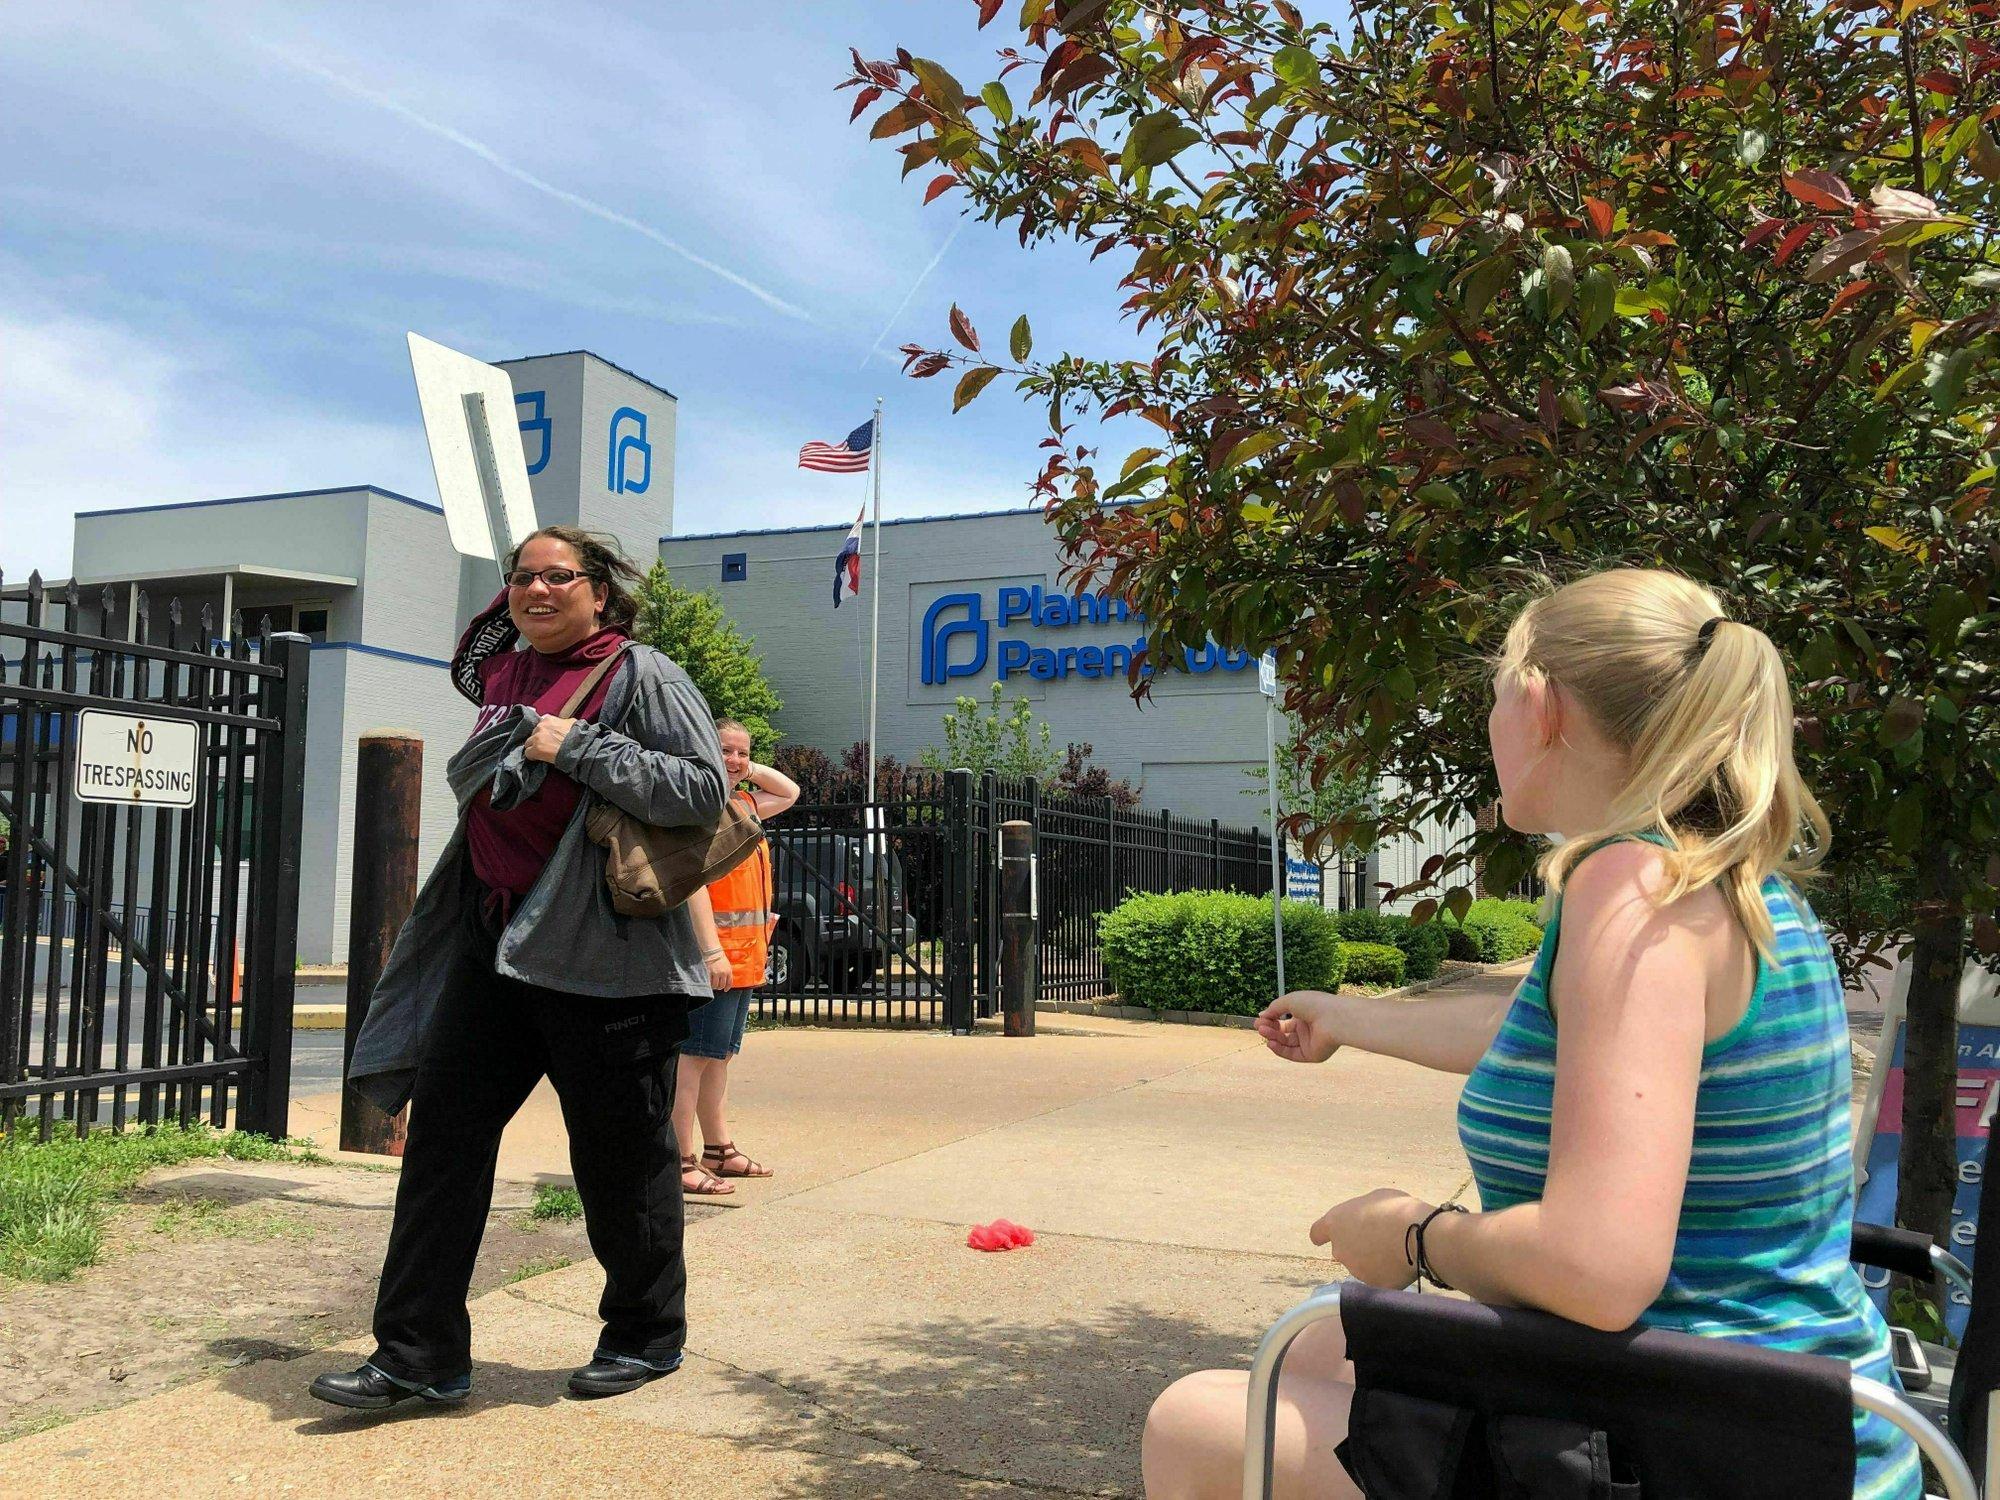 Planned Parenthood: Missouri's last abortion clinic may shut